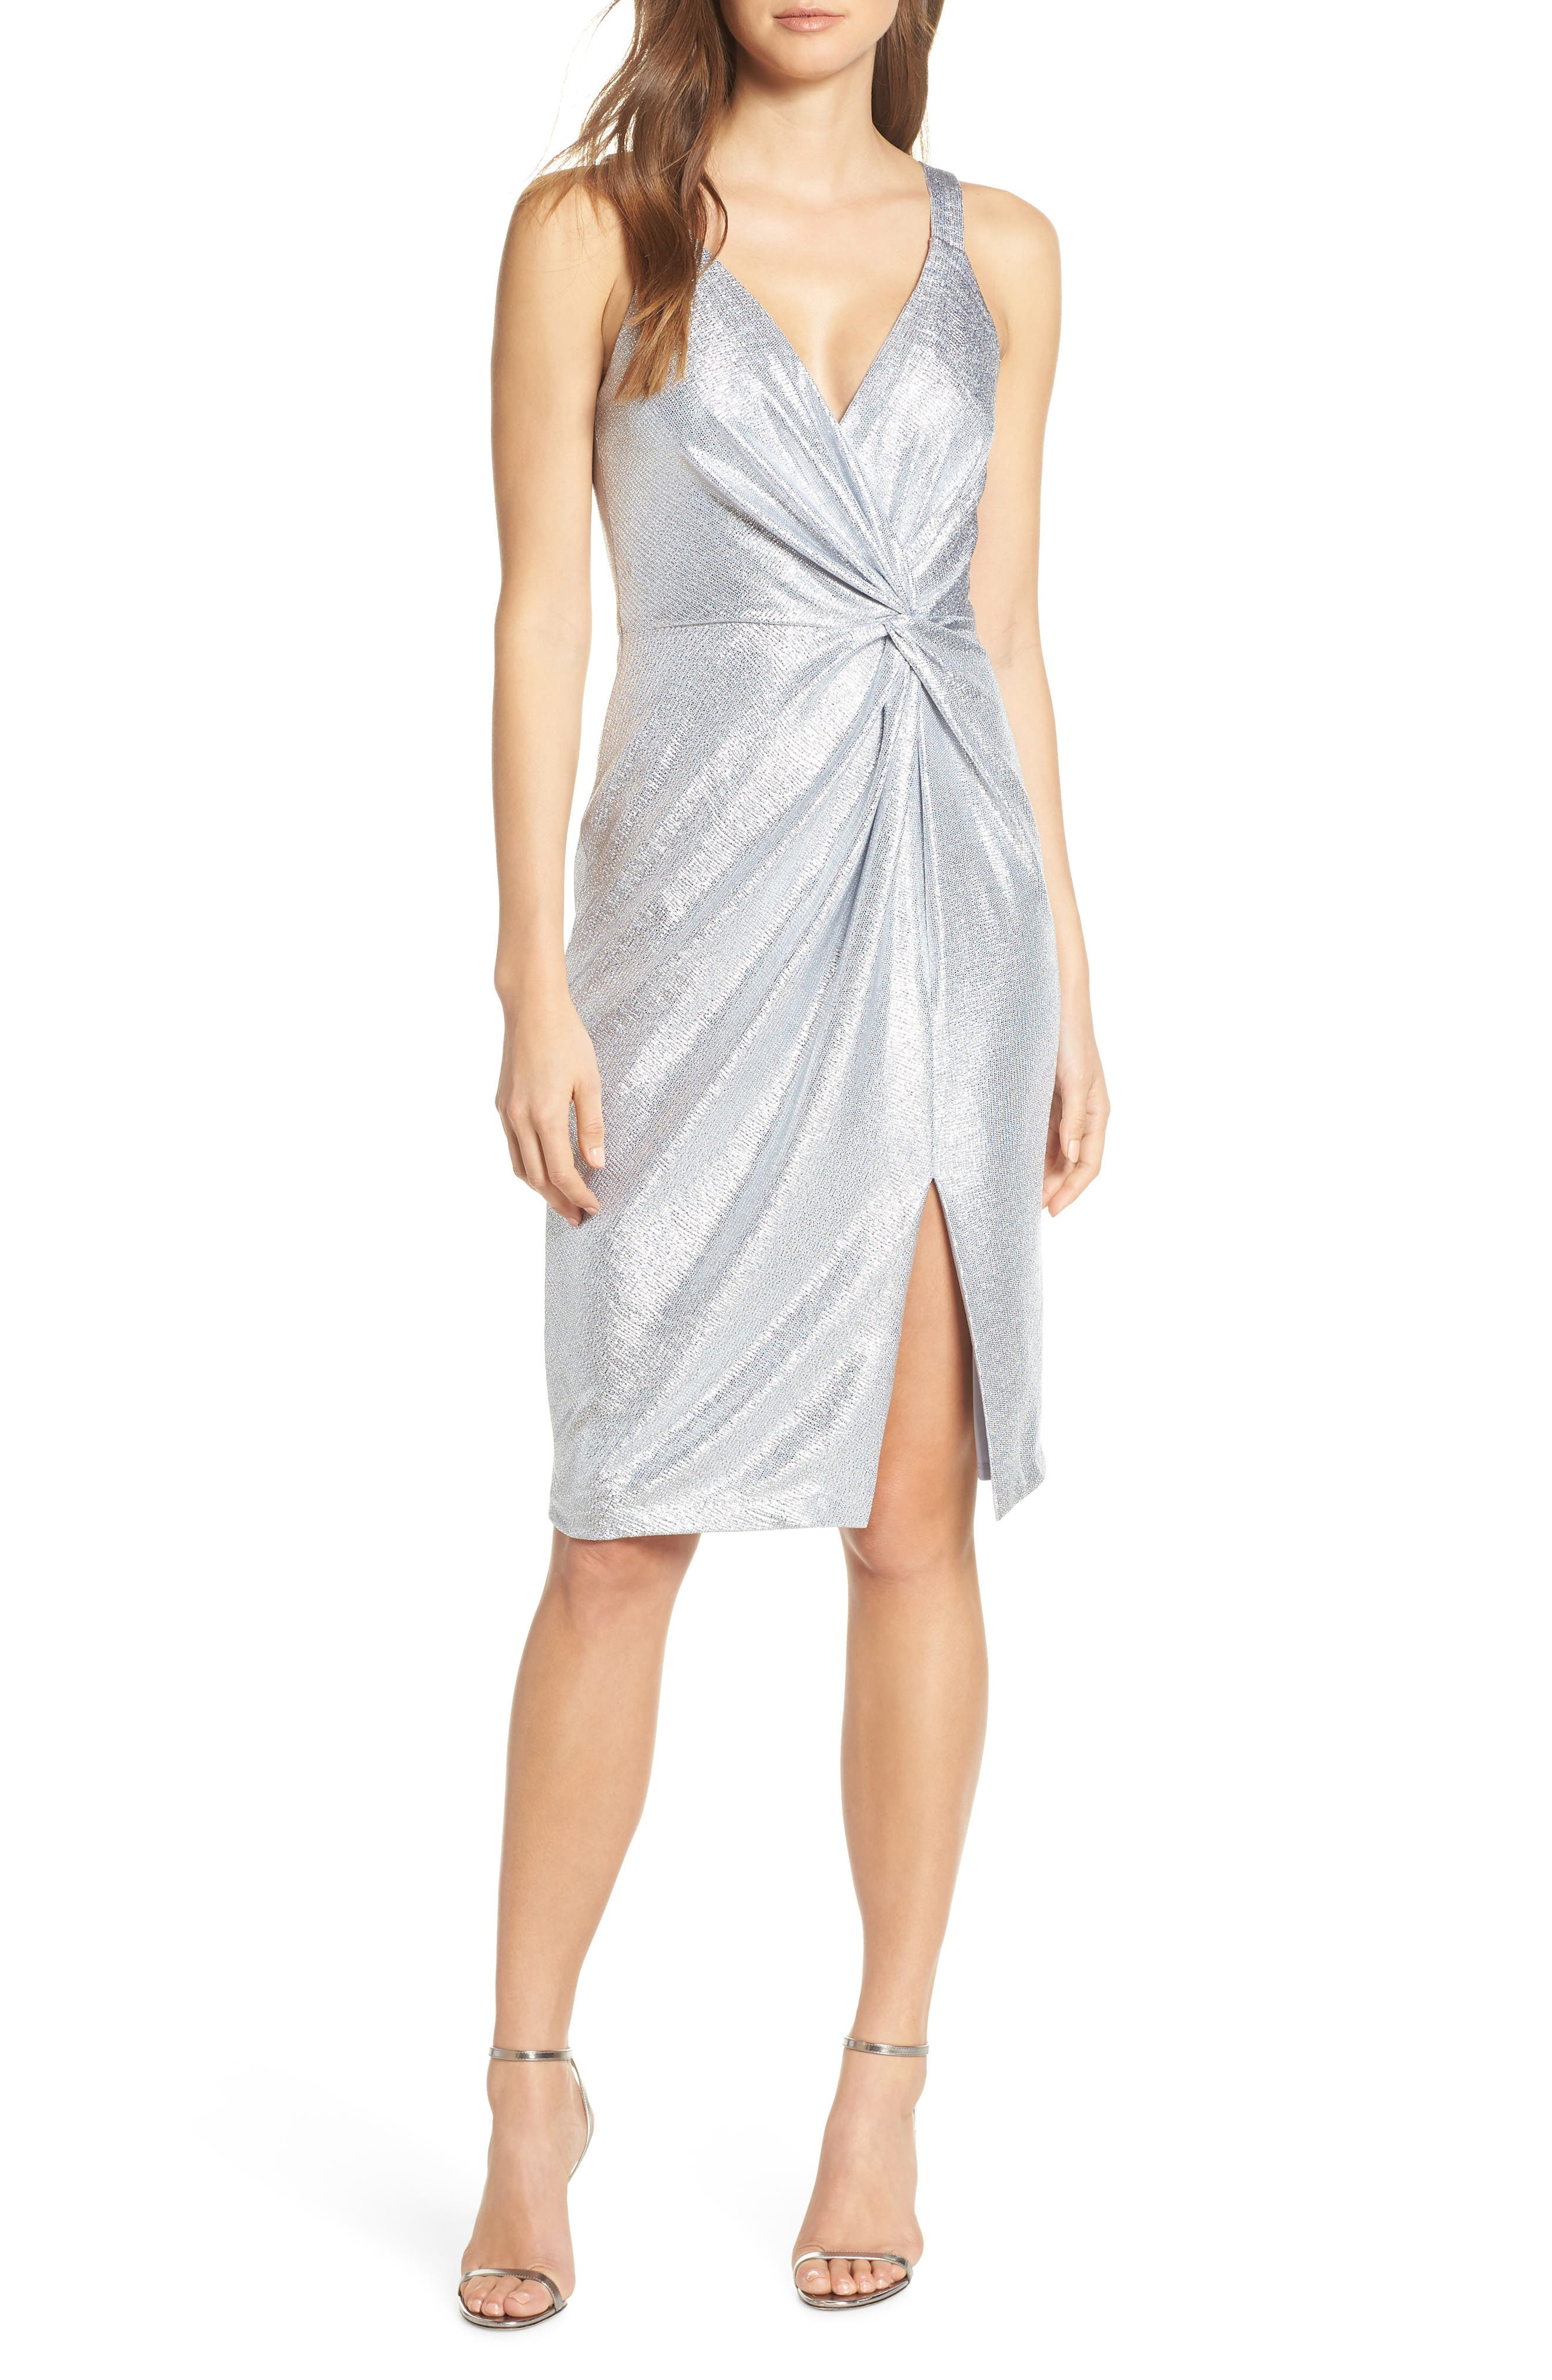 1960s Prom Dresses